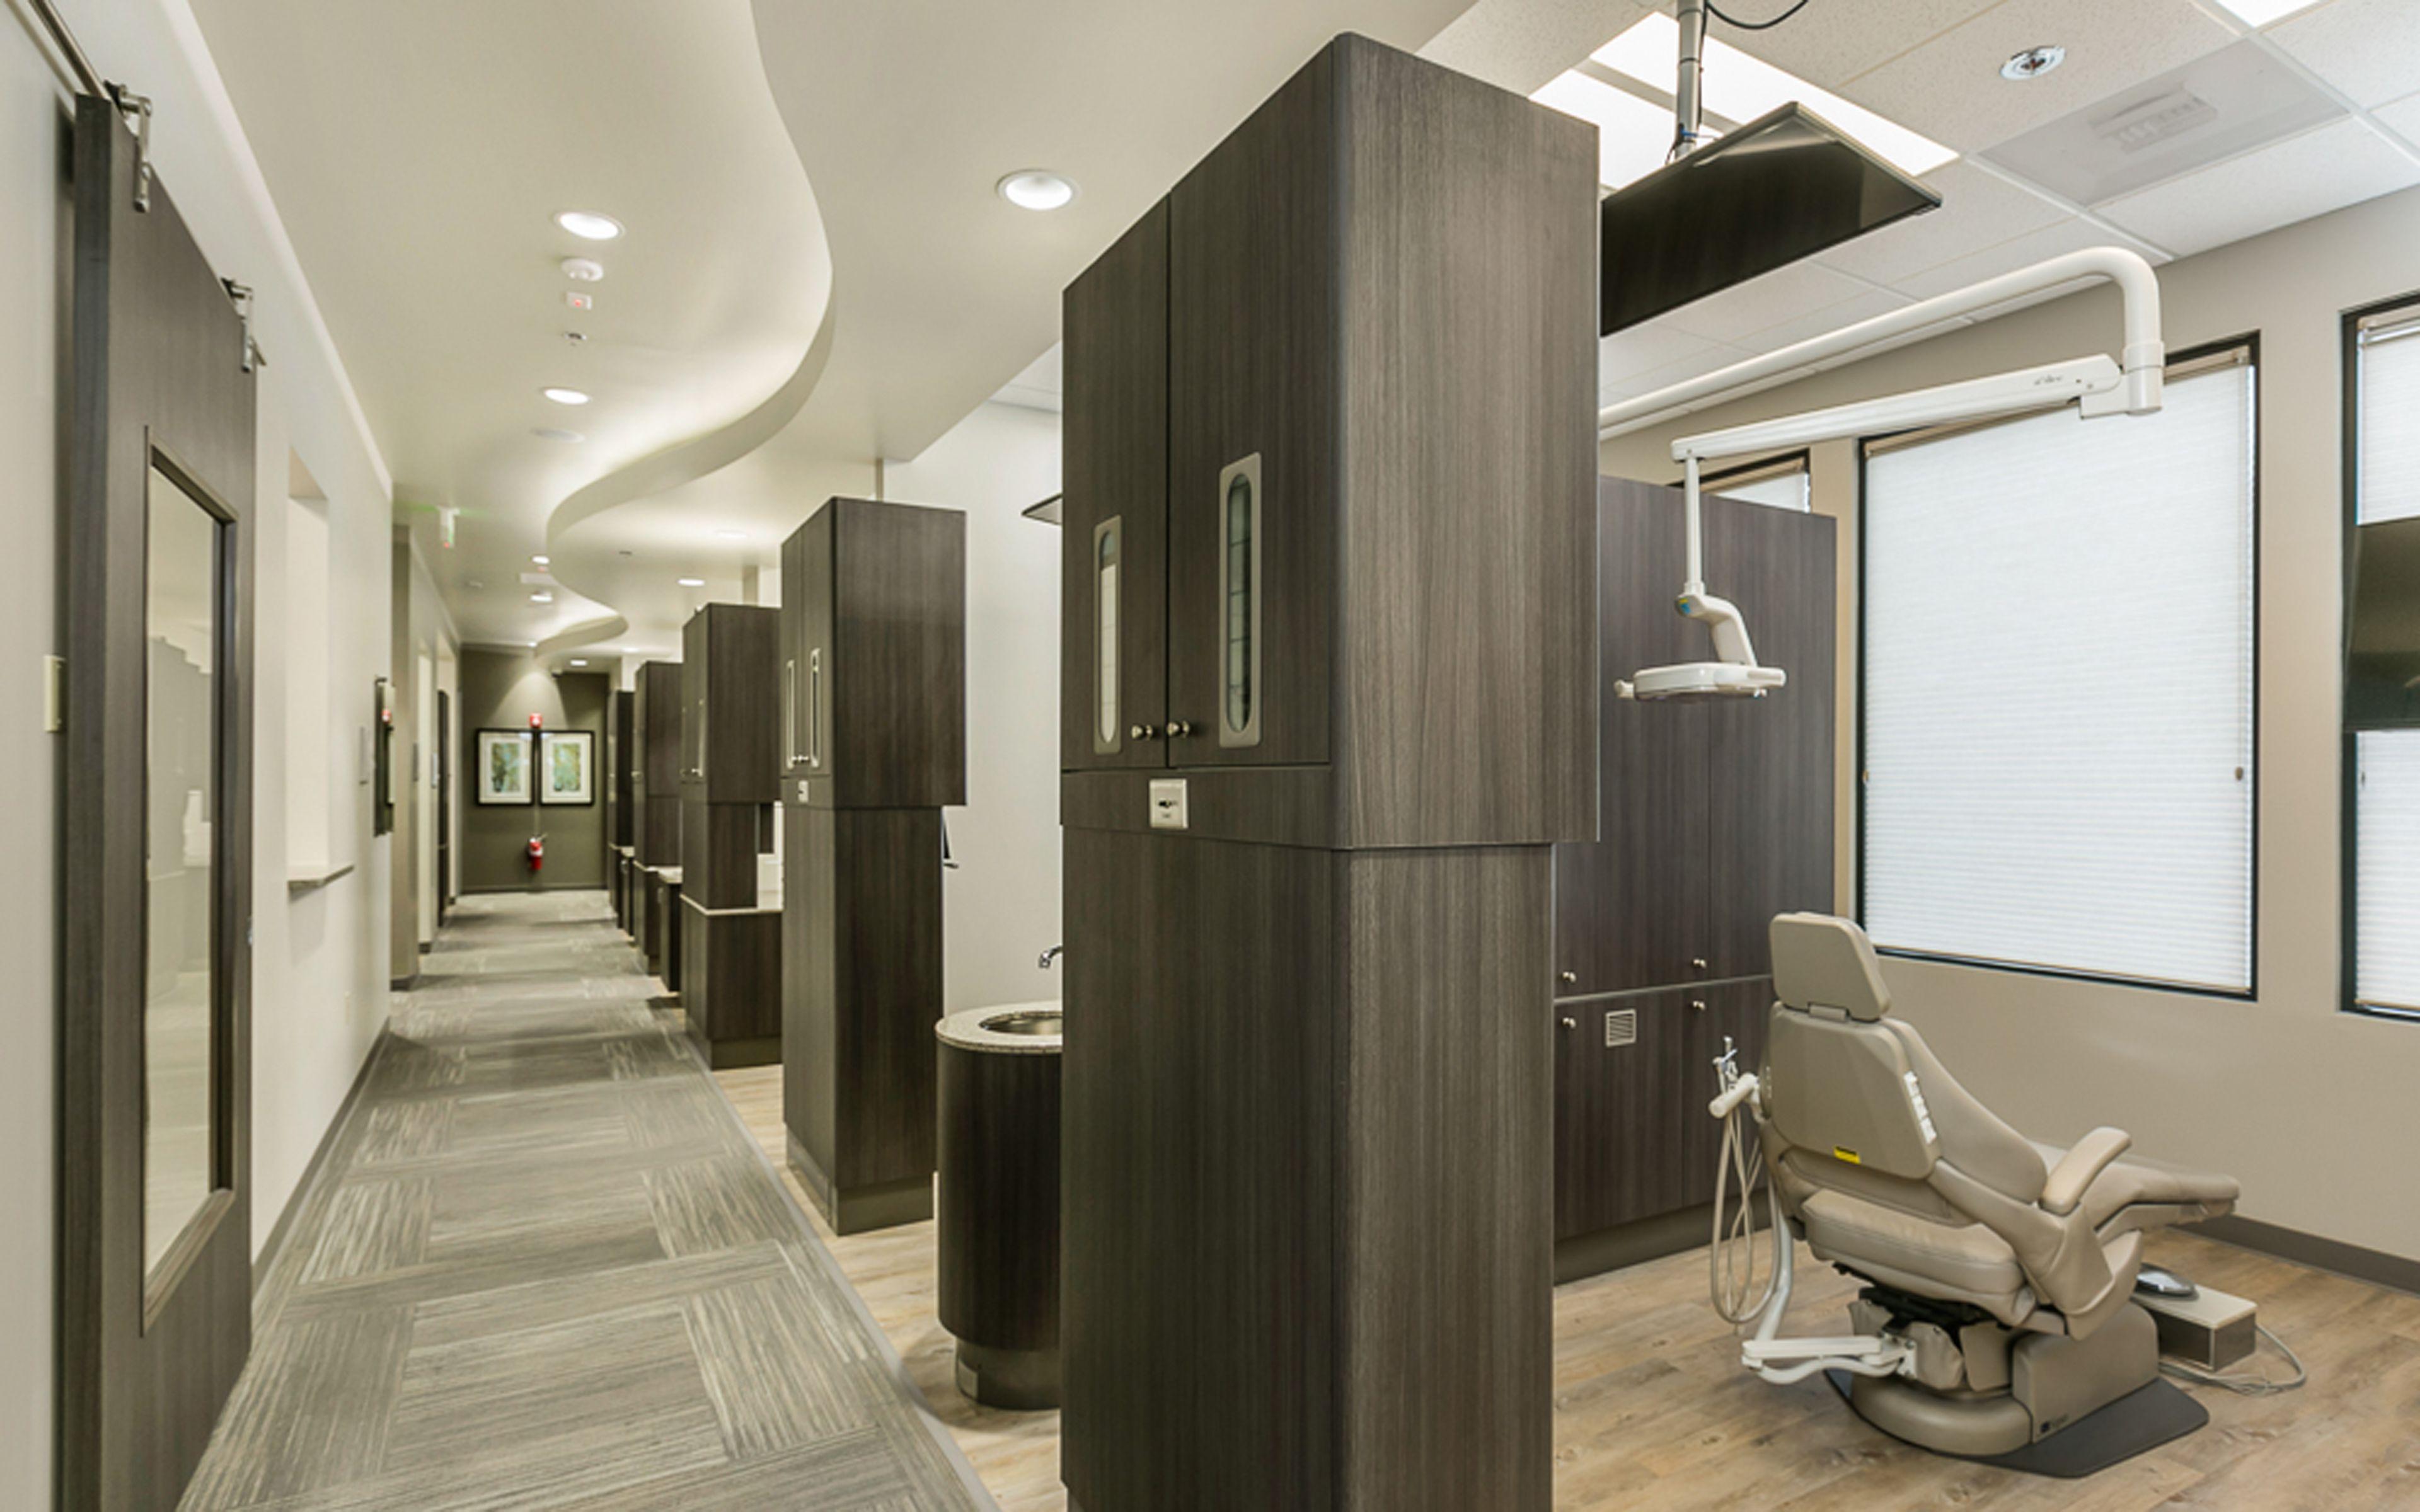 Office hallway lighting  Gresham Dental Group Gresham OR modern dental office design